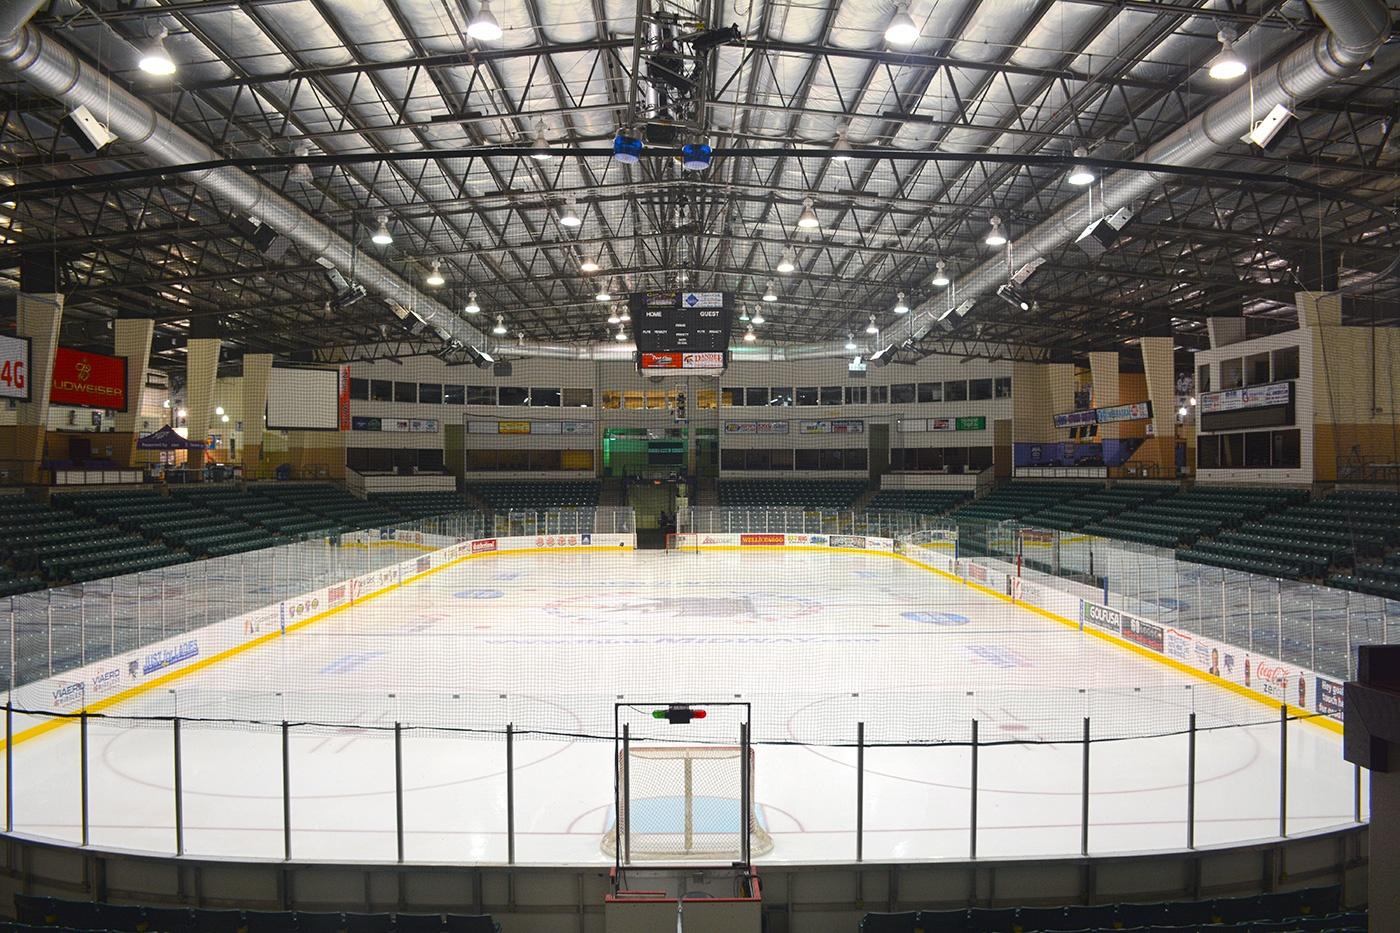 Viaero Events Center Ice Rink